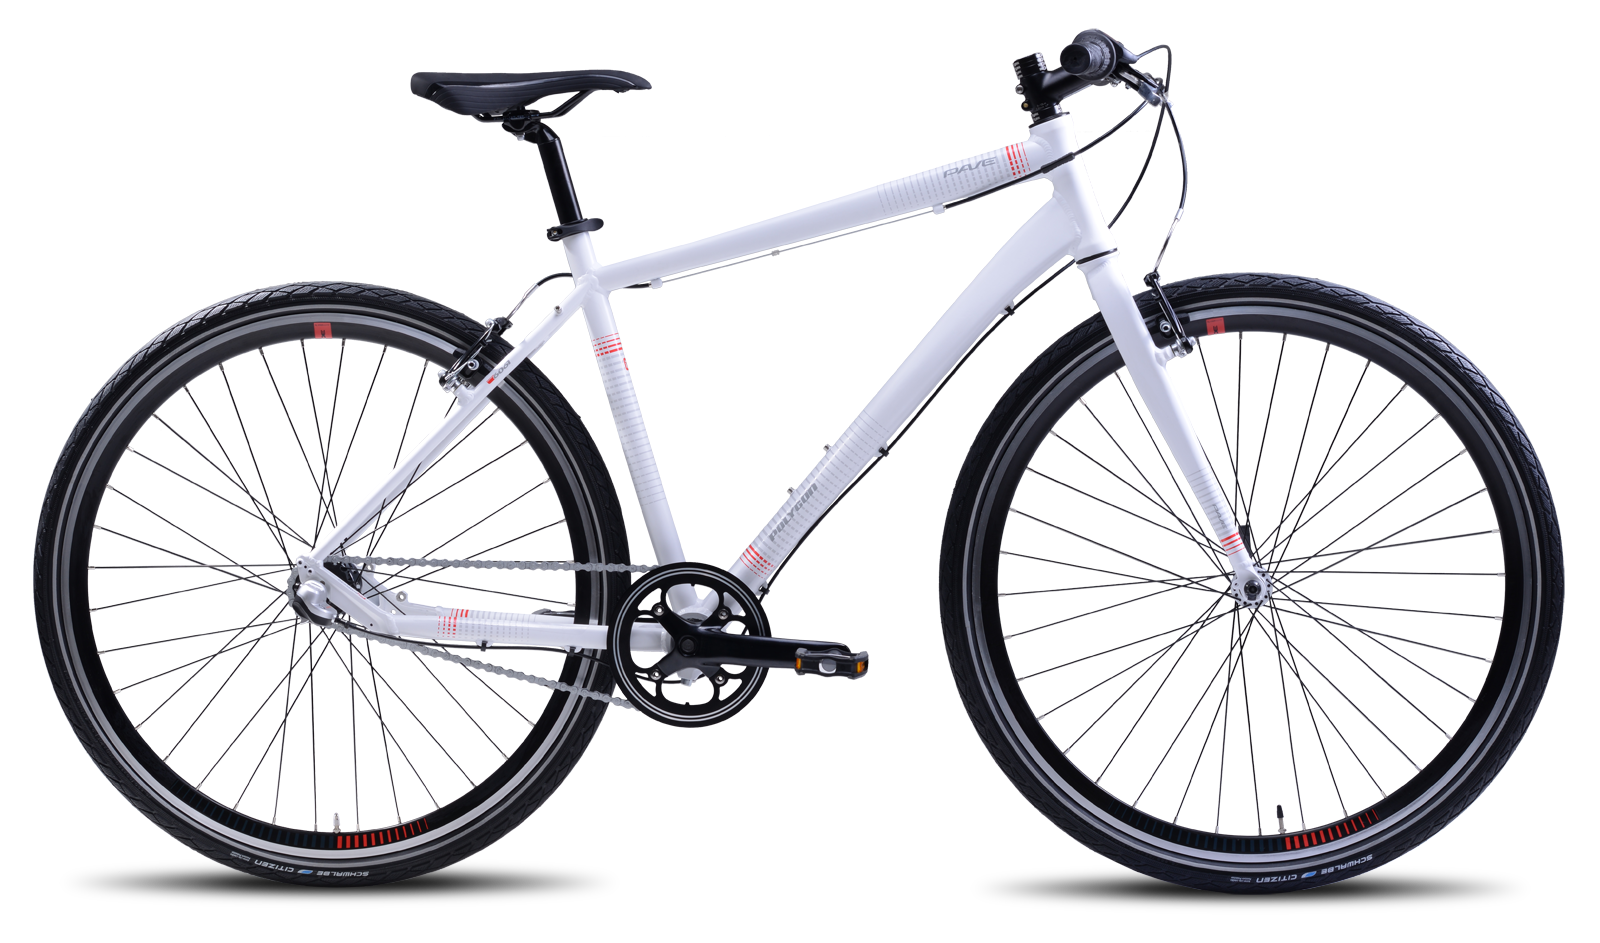 Harga Dan Spesifikasi Pave I3 Polygon Roda Malaka Bikes Sepeda Balap Helios A60 700c